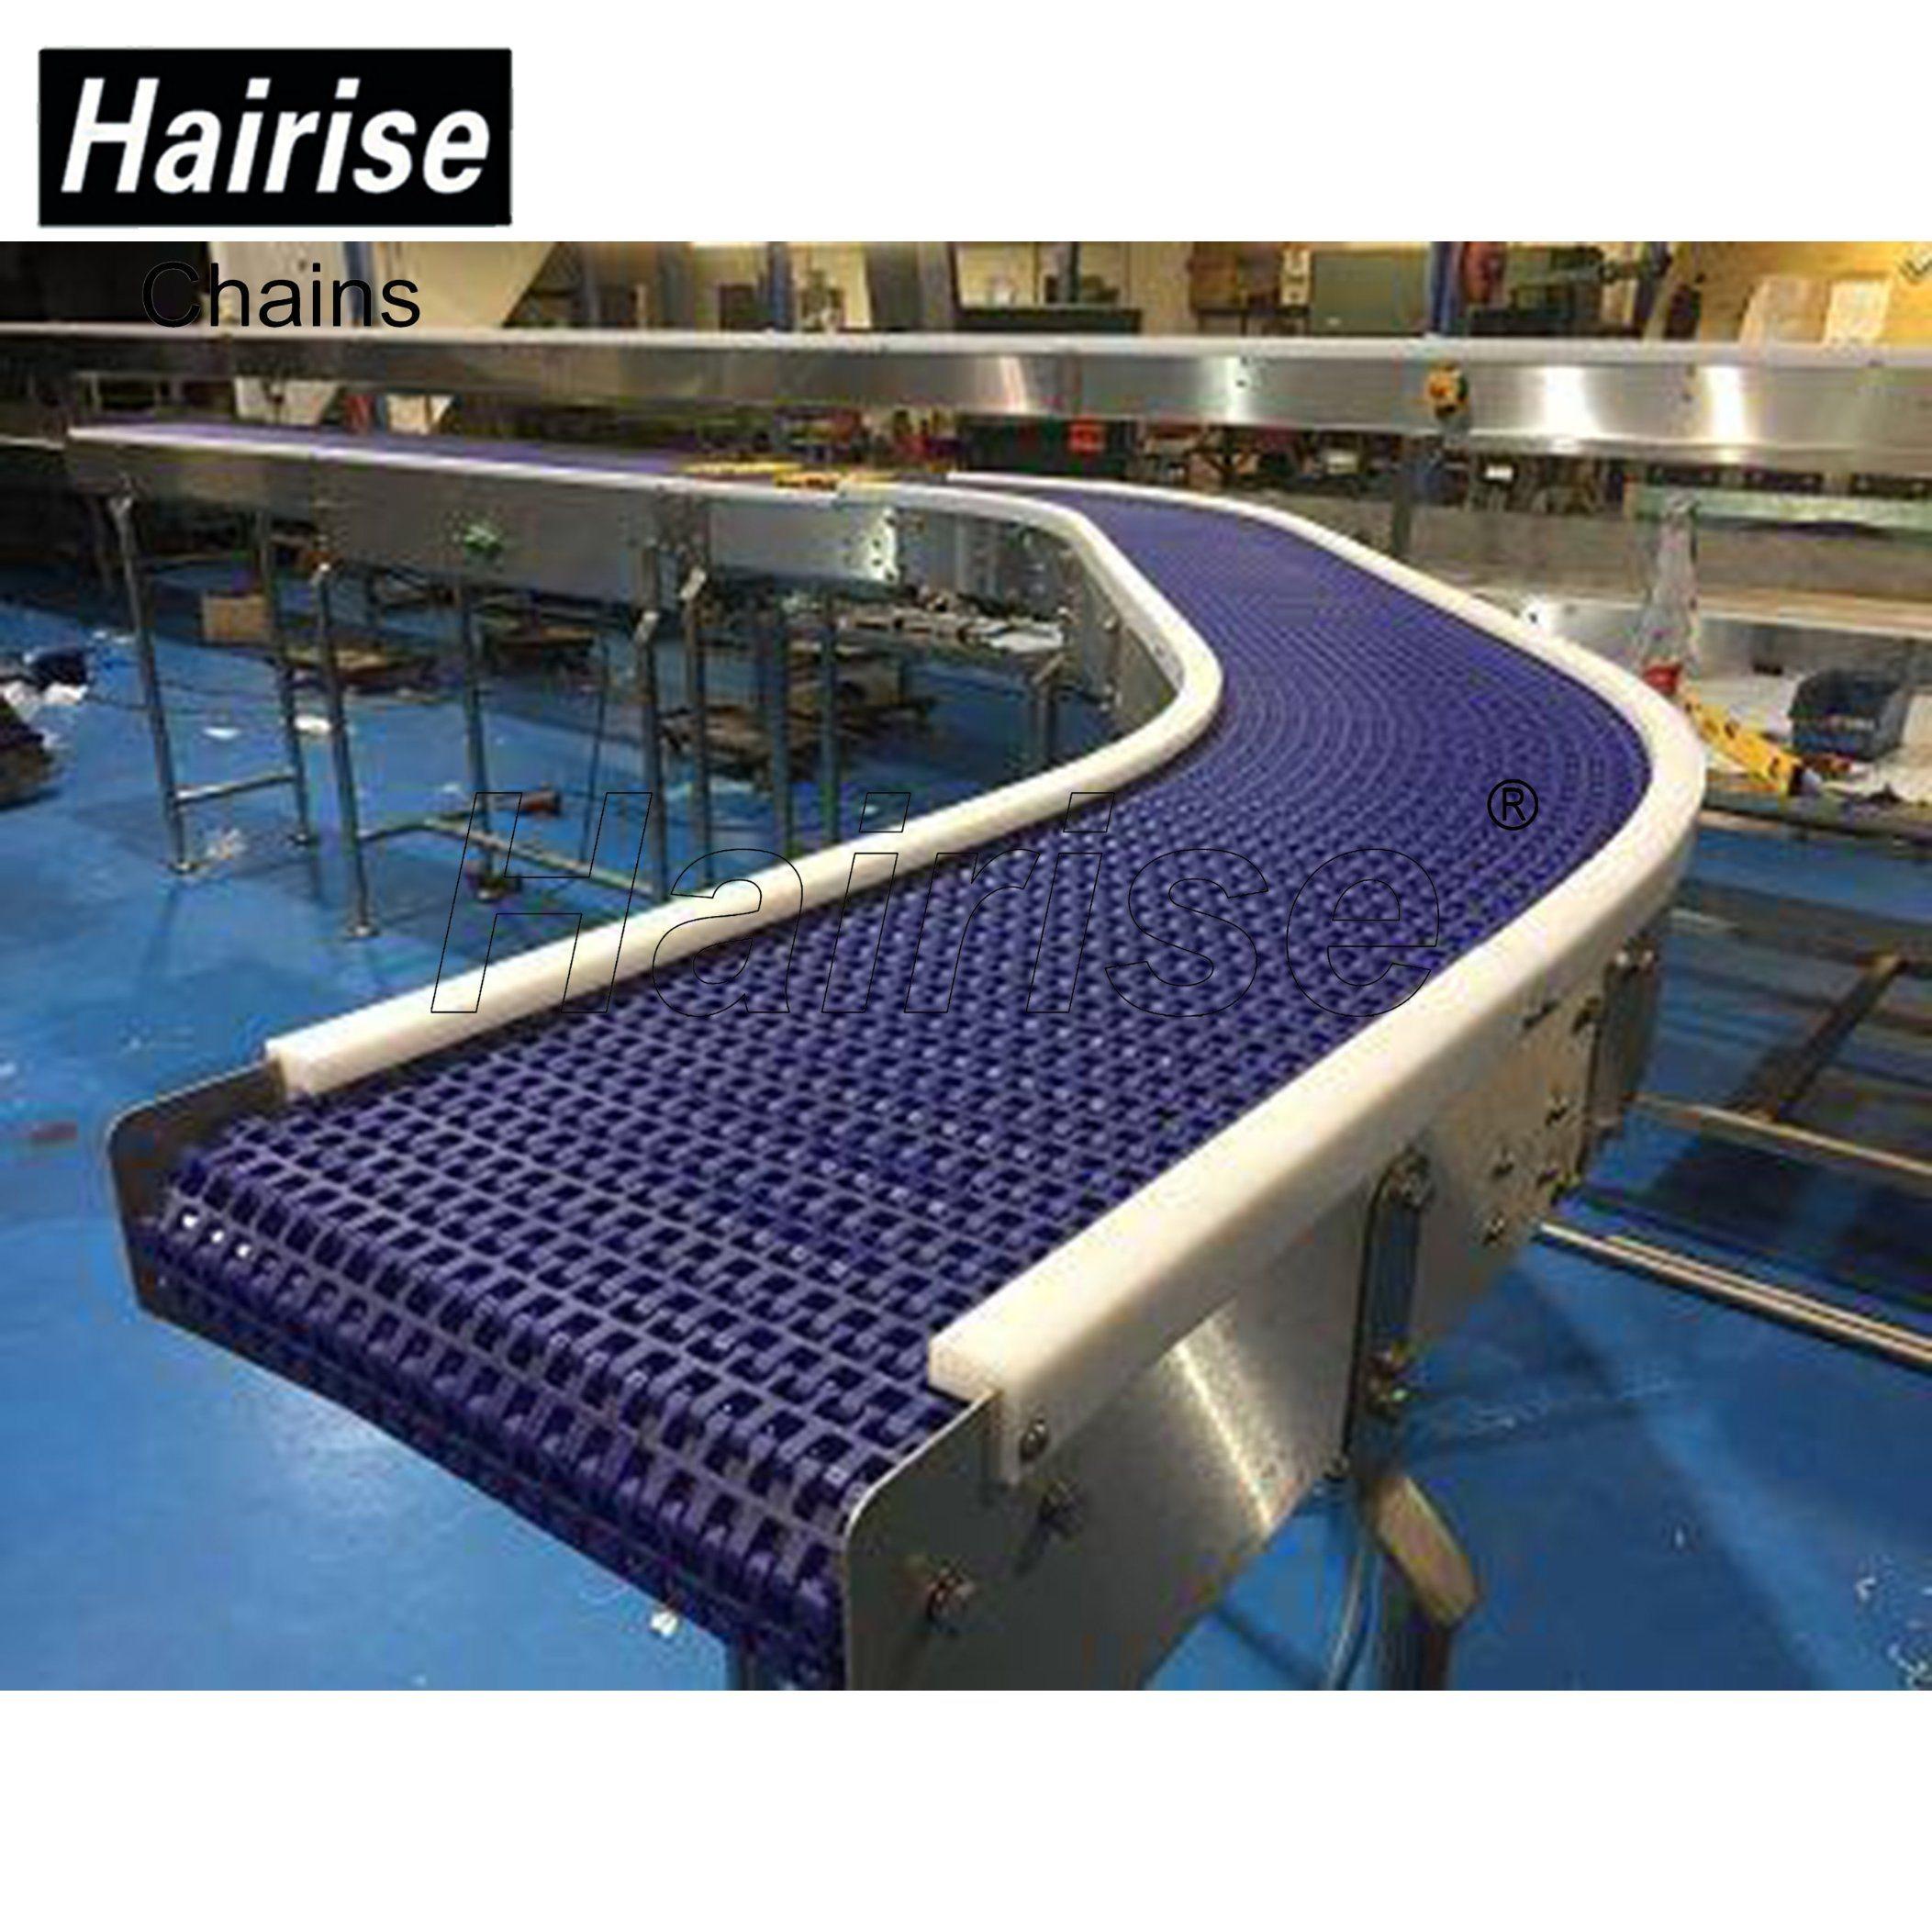 China Hairise Scale Chute Motorized Material Handling Skid